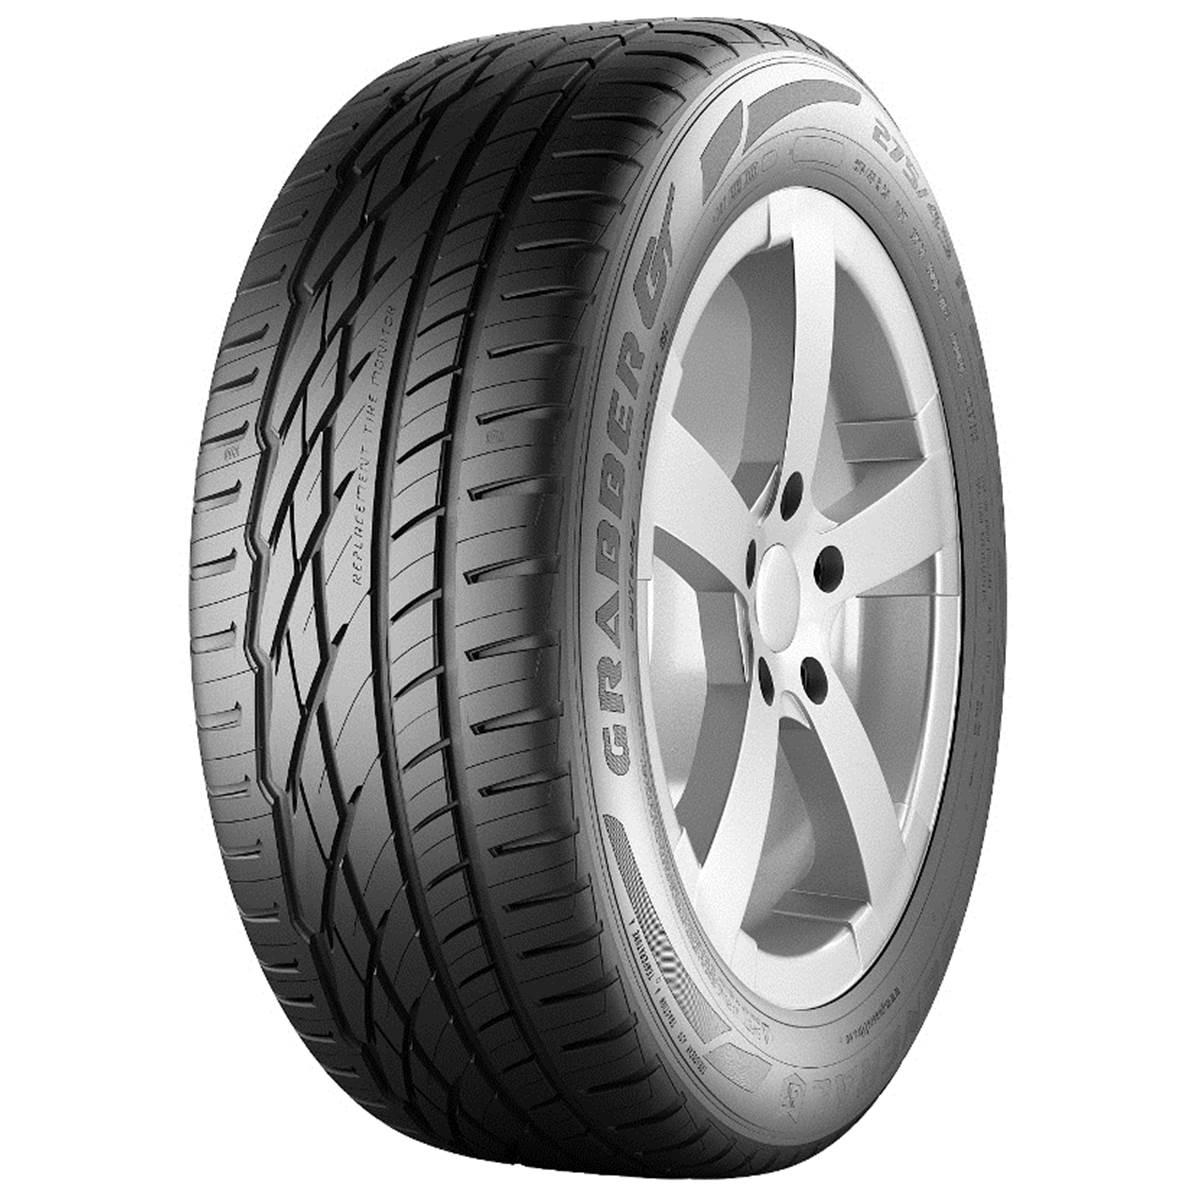 Pneu 4X4 General Tire 275/40R20 106Y Grabber Gt XL